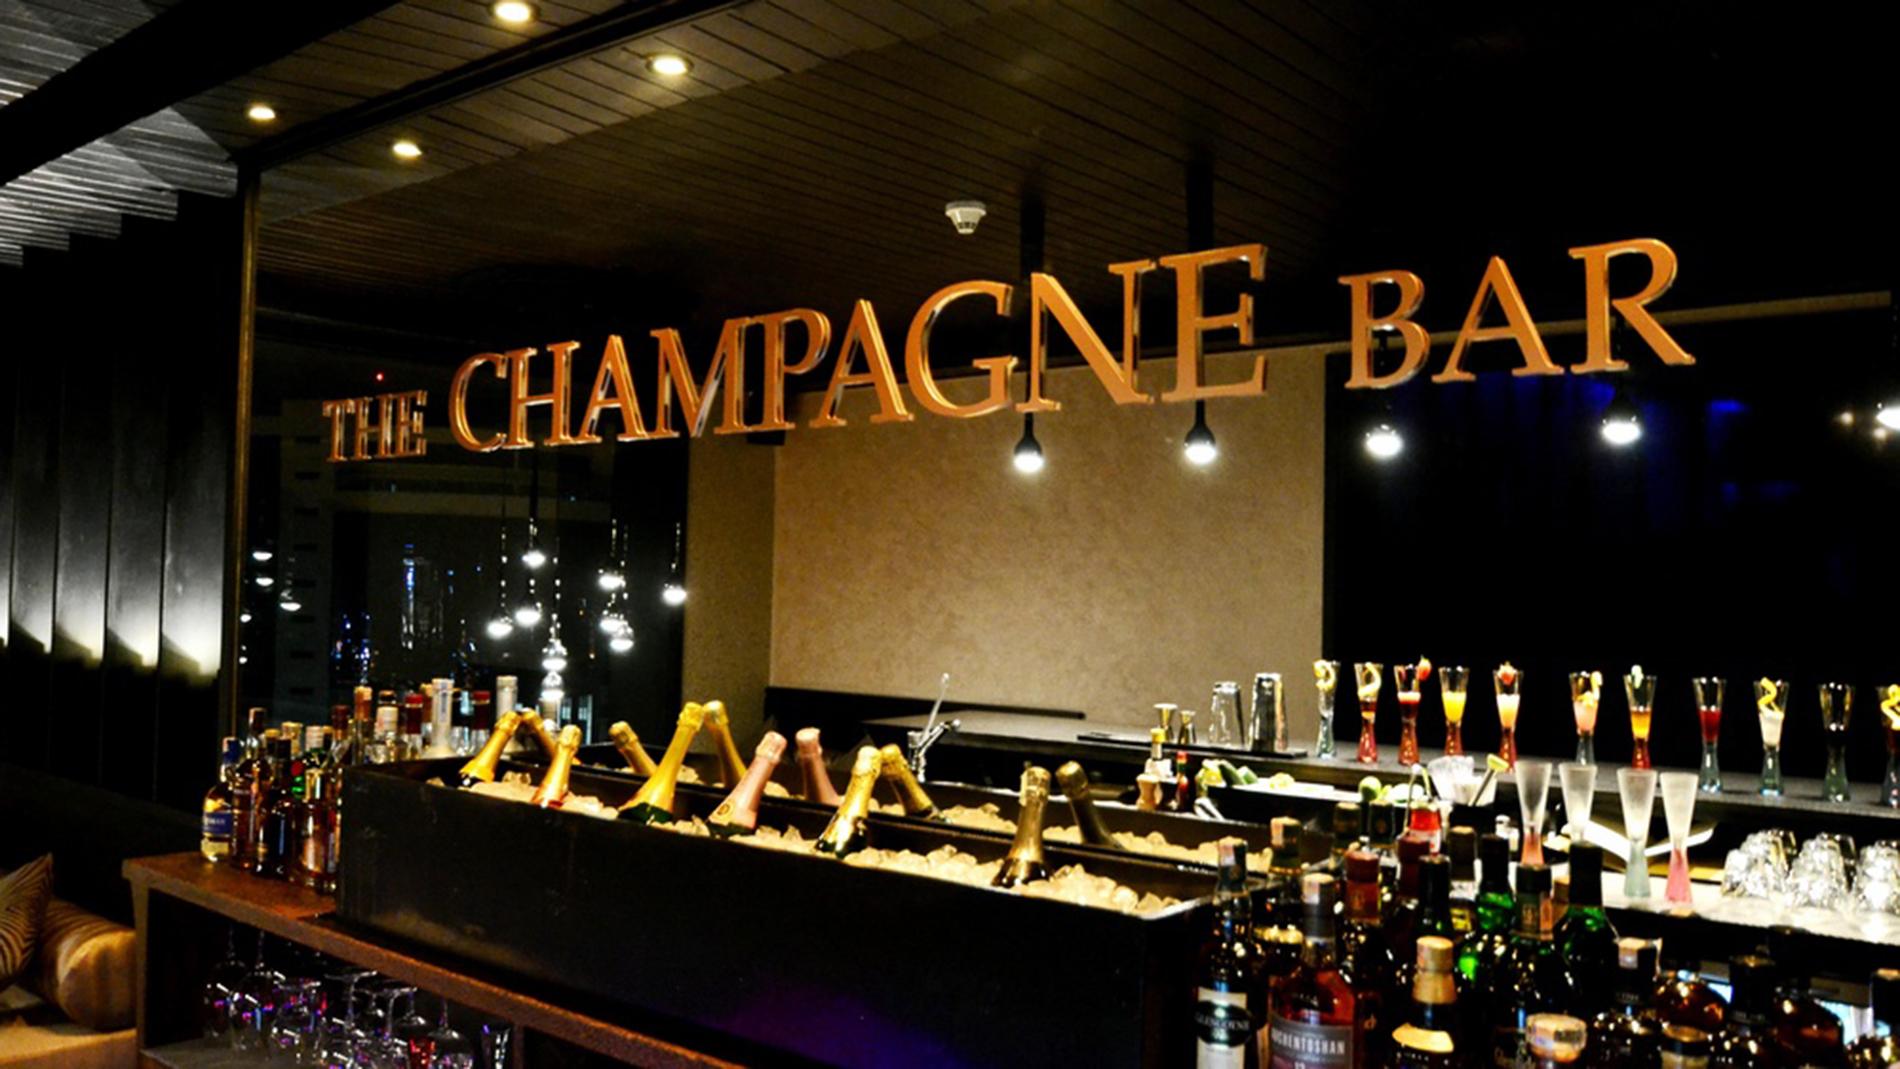 http://cdn.cnn.com/cnnnext/dam/assets/161220174649-kenya-bars-champagne-bar-at-the-sakara-hotel-nairobi-1.jpg